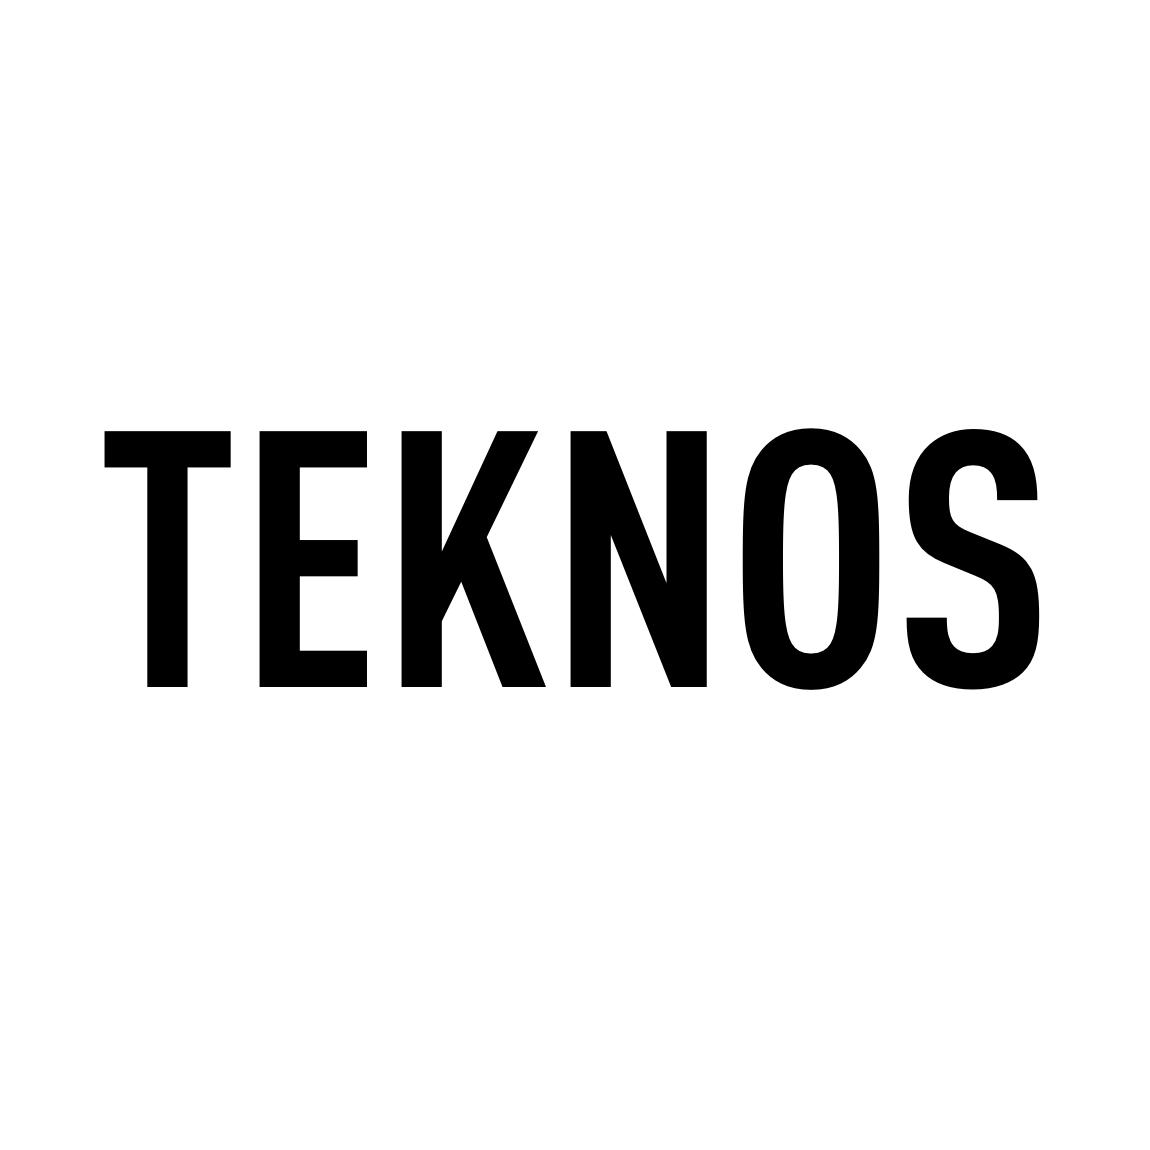 teknos logo.png